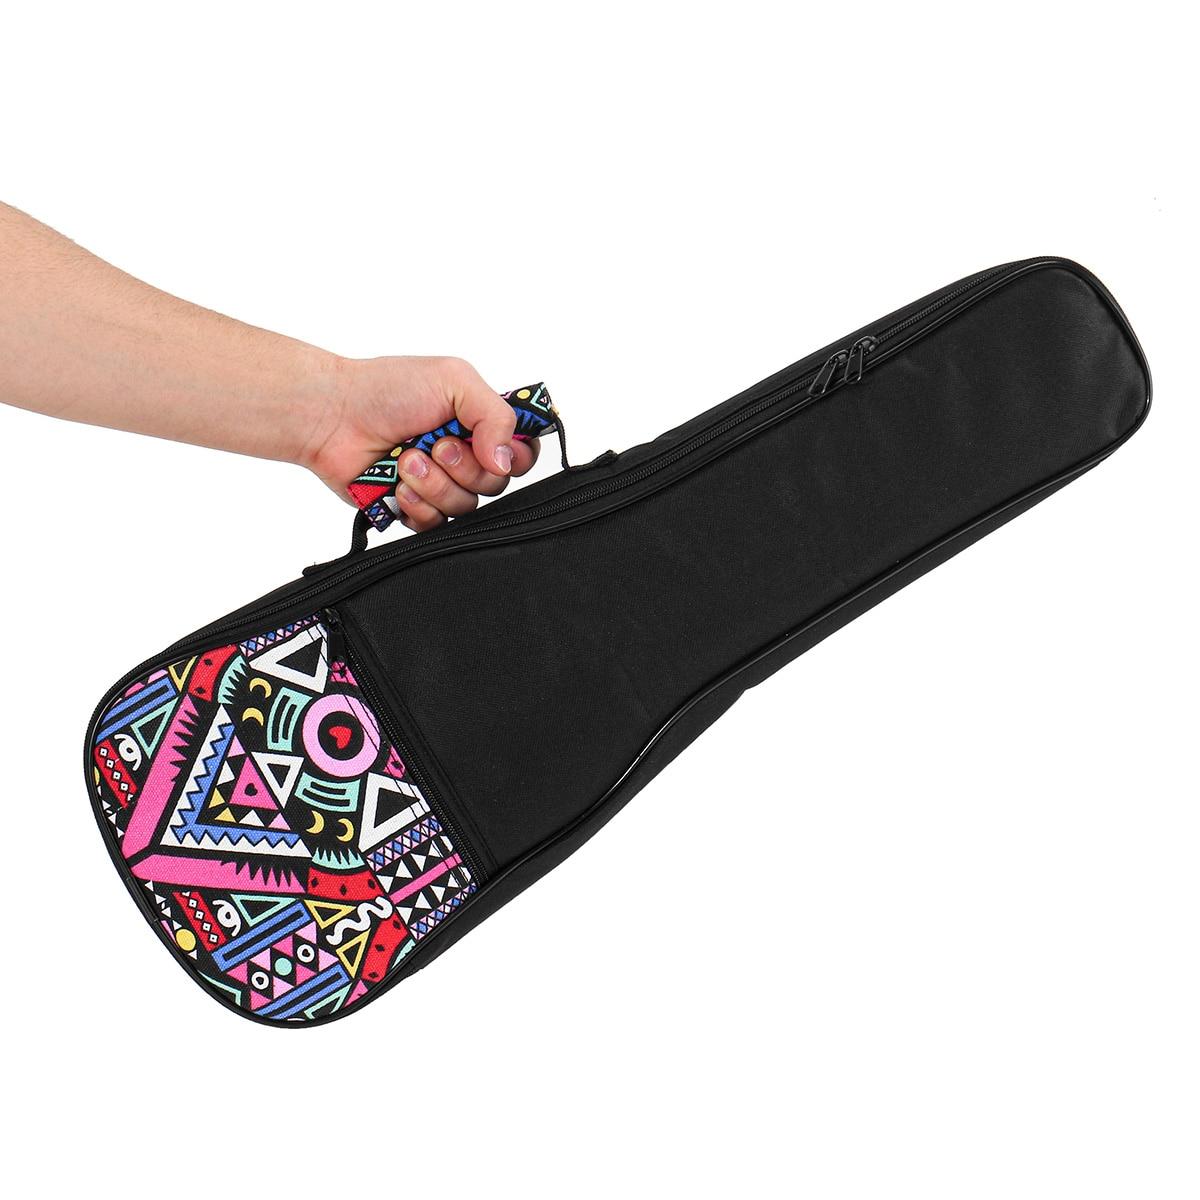 Portable Ukulele Bag Instrument Padded Gig Carry Bag Concert Carry Case Cover For Ukulele Guitar Parts Accessories 21/23/26 Inch